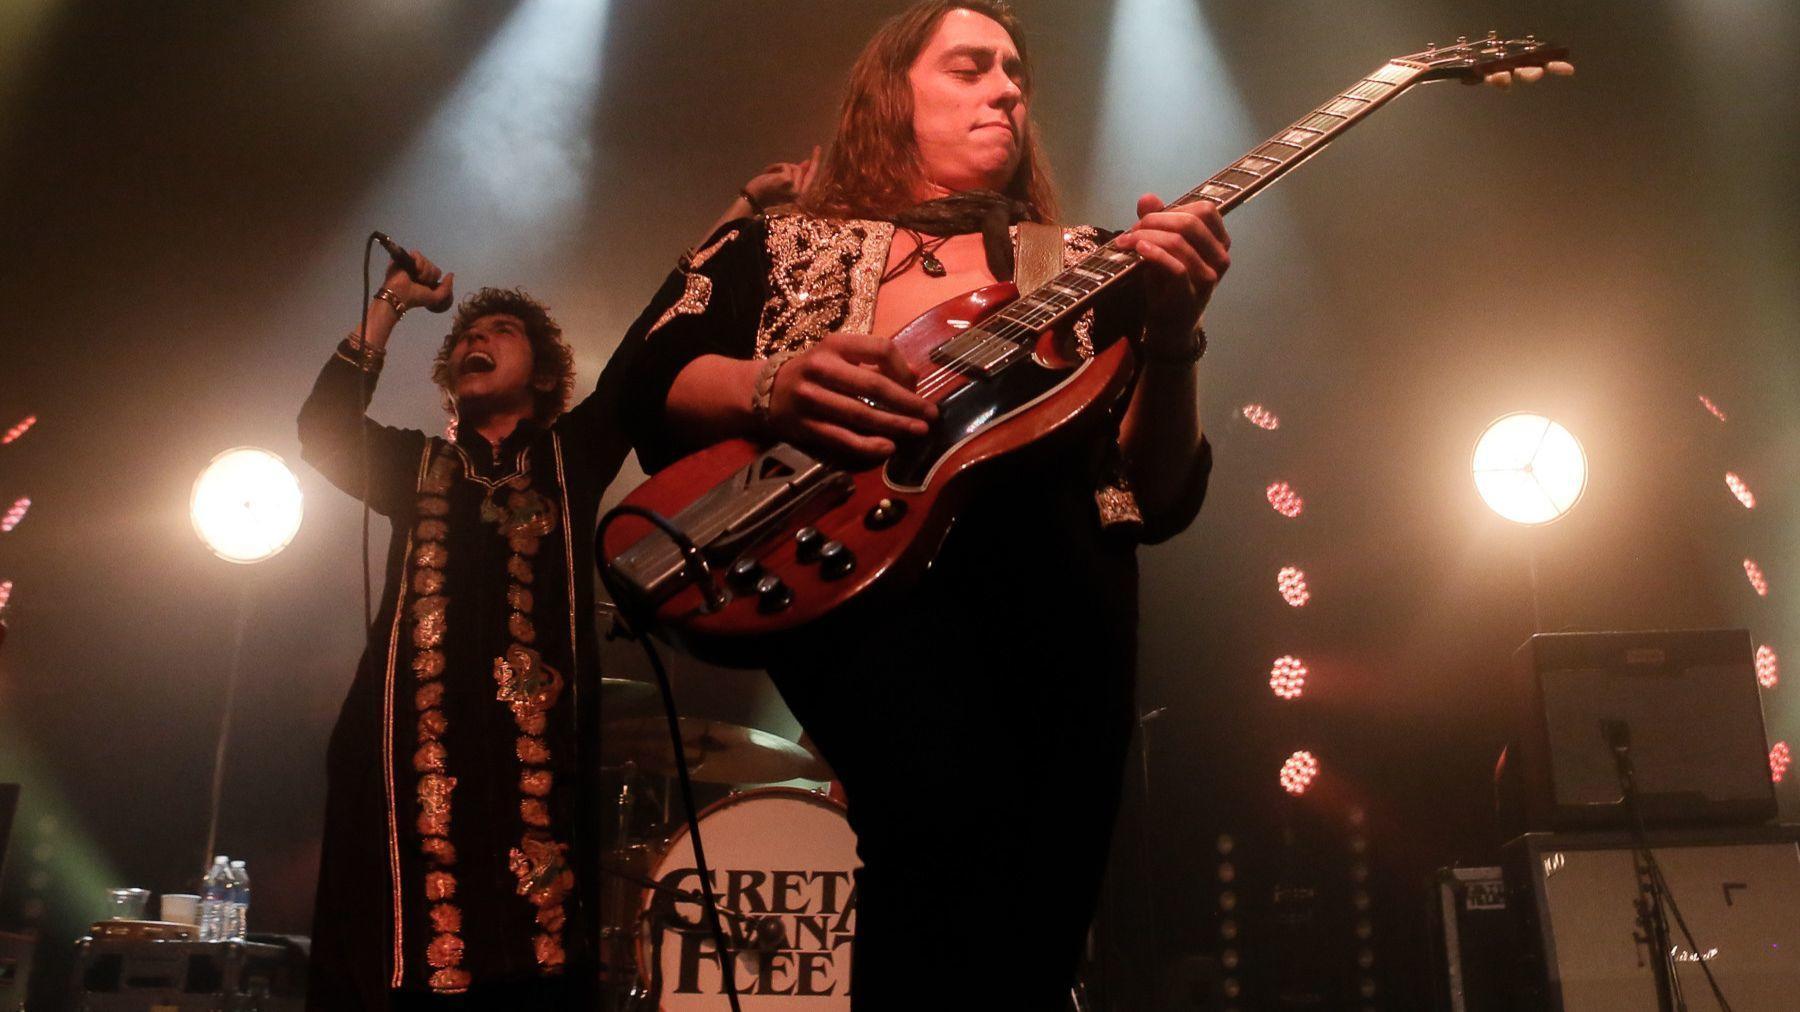 Michigan Rockers: Greta Van Fleet had a sellout crowd roaring from the  get-go. (Photo/Jamie Geysbeek)